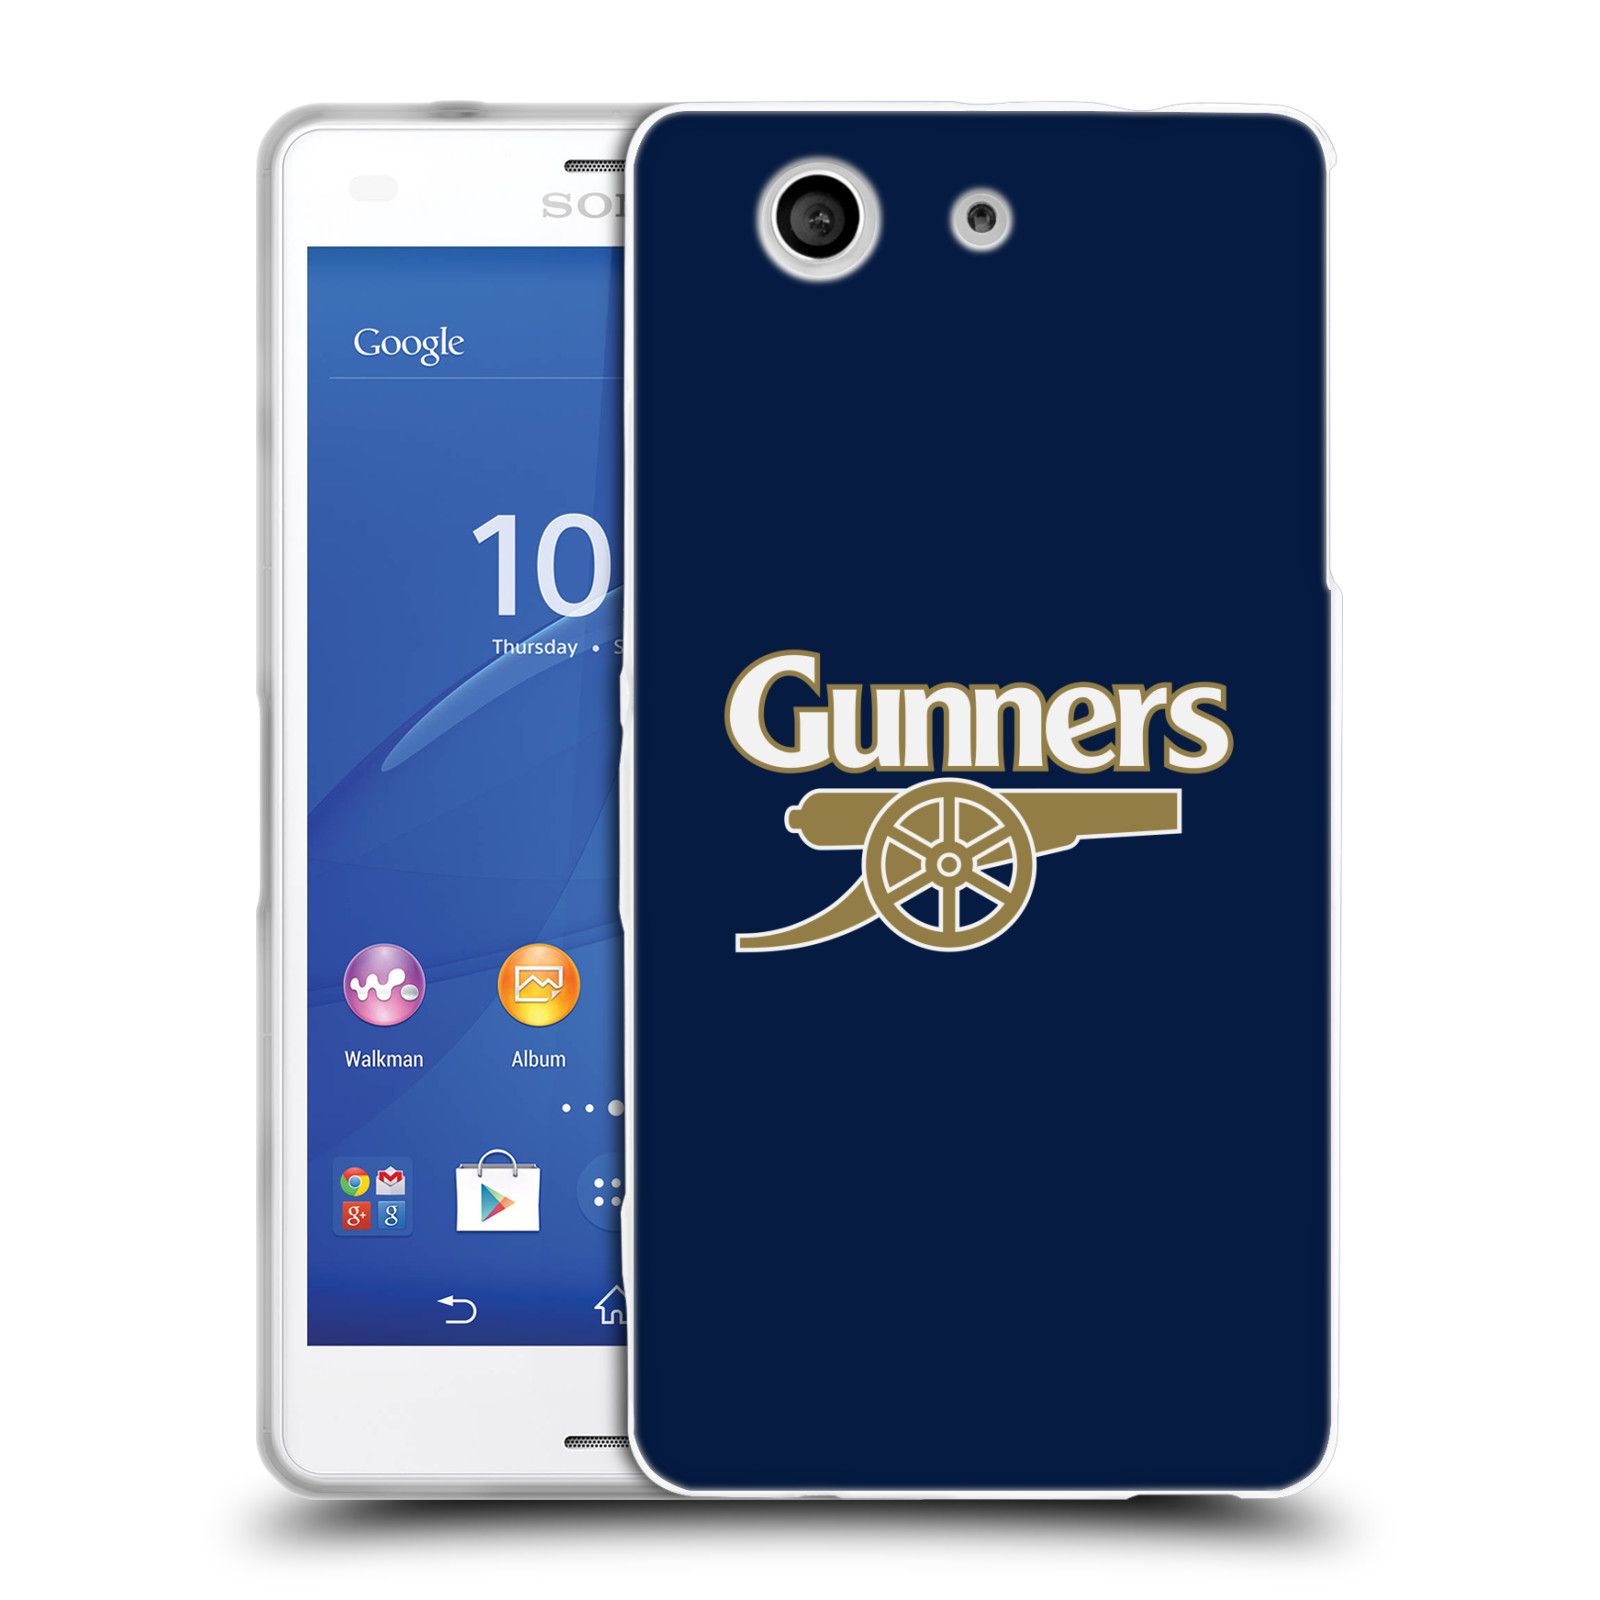 Silikonové pouzdro na mobil Sony Xperia Z3 Compact D5803 - Head Case - Arsenal FC - Gunners